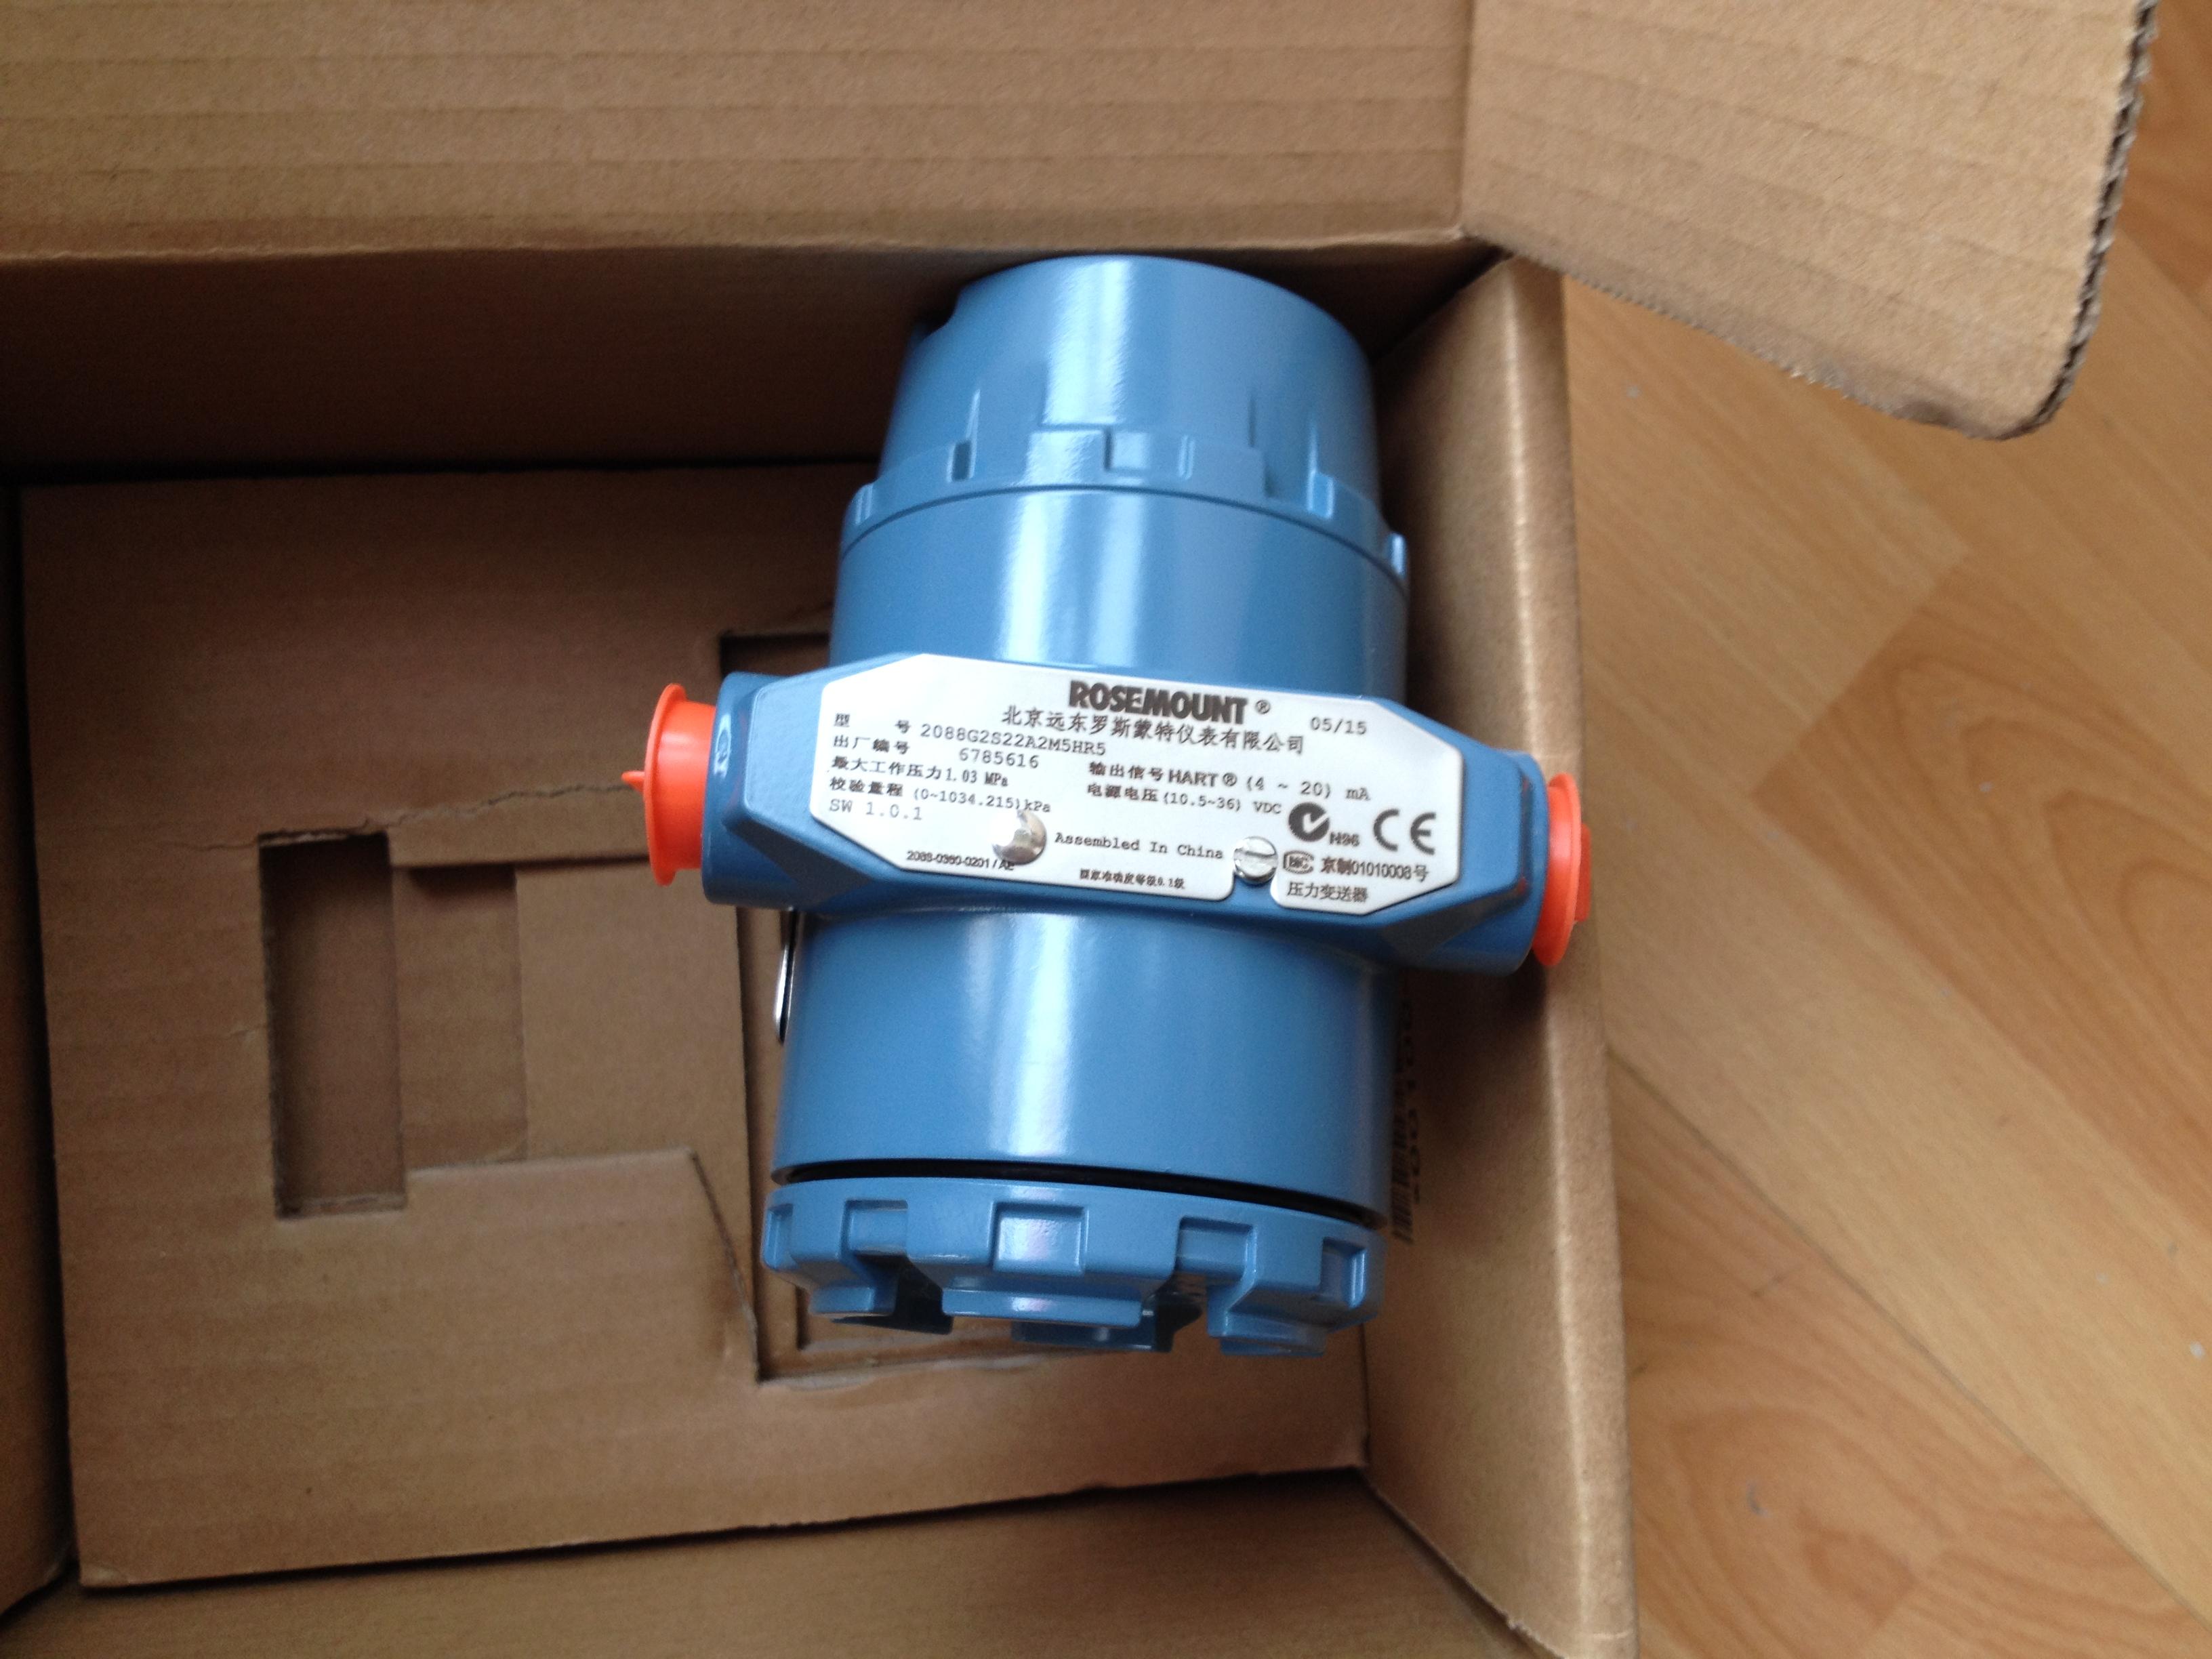 Emerson Rosemount 2088 pressure transmitters from China